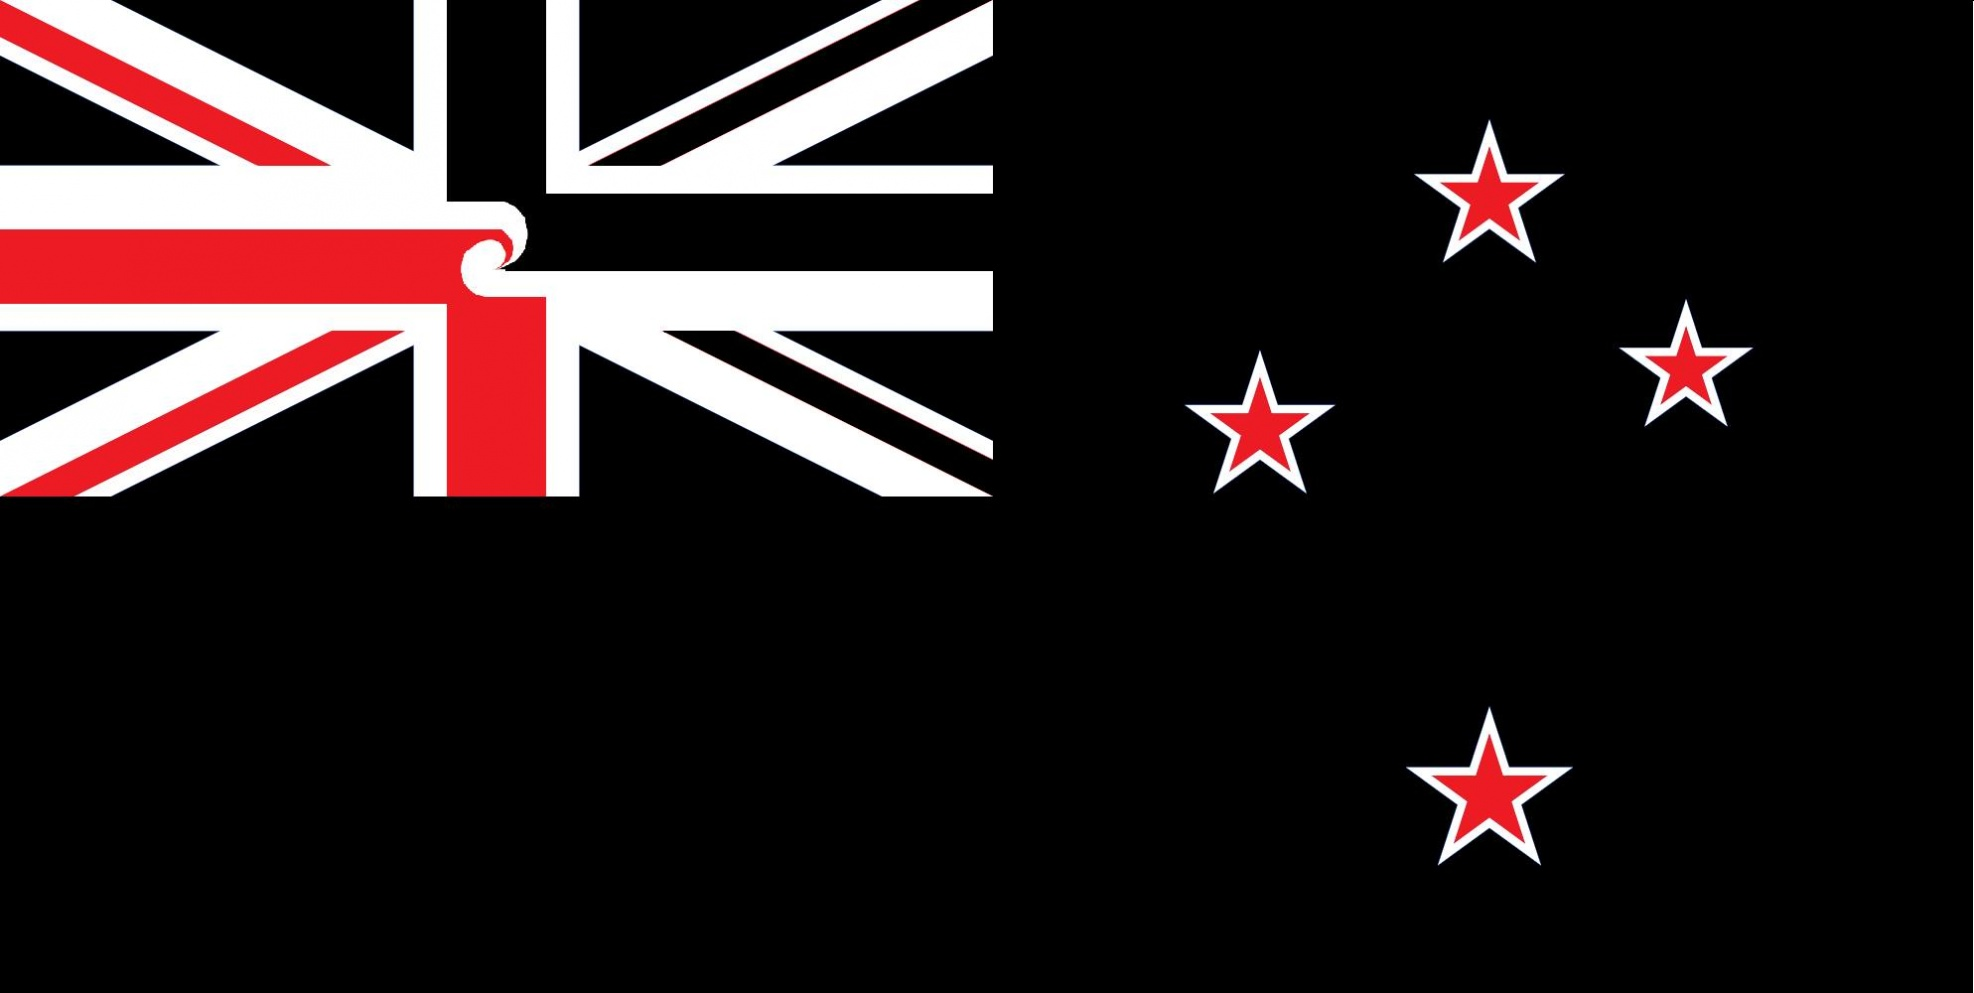 New Zealand Flag Wallpaper: Fotolip.com Rich Image And Wallpaper